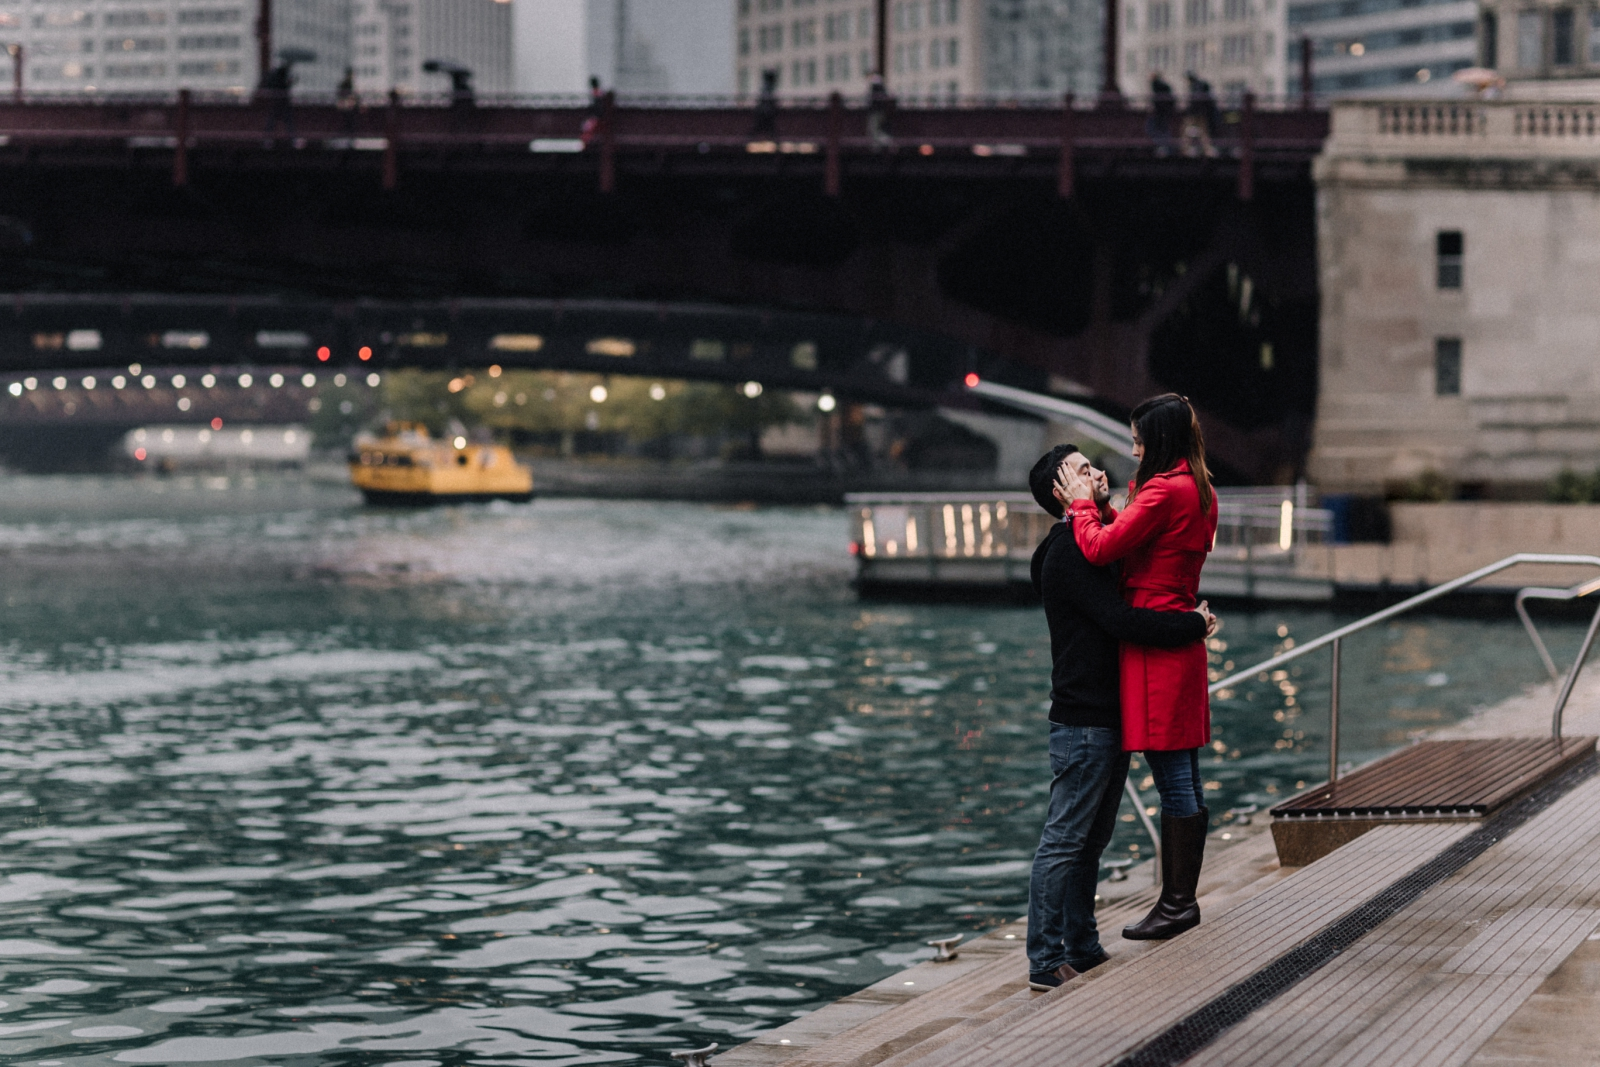 Riverwalk | Chicago vacation photography | lisa kathan photography